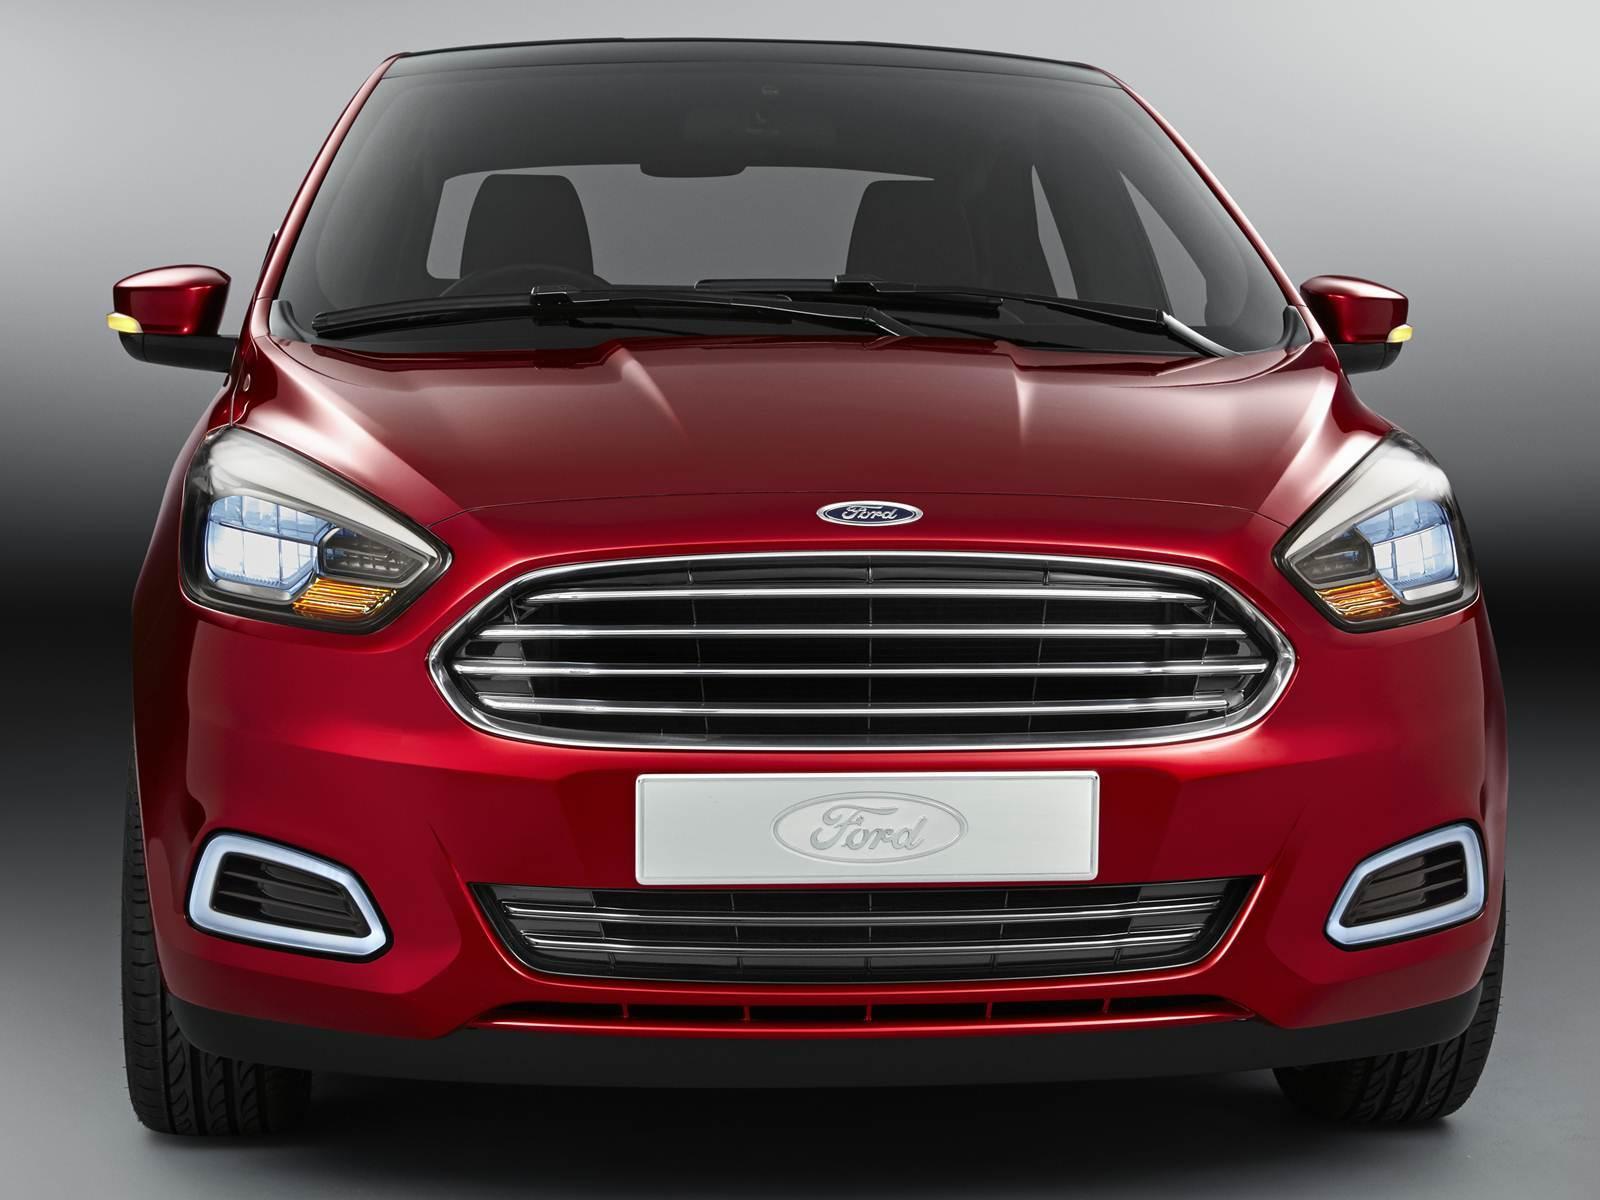 Novo Ford Ka 2015 Tem Vers 227 O Sed 227 Carro Bonito